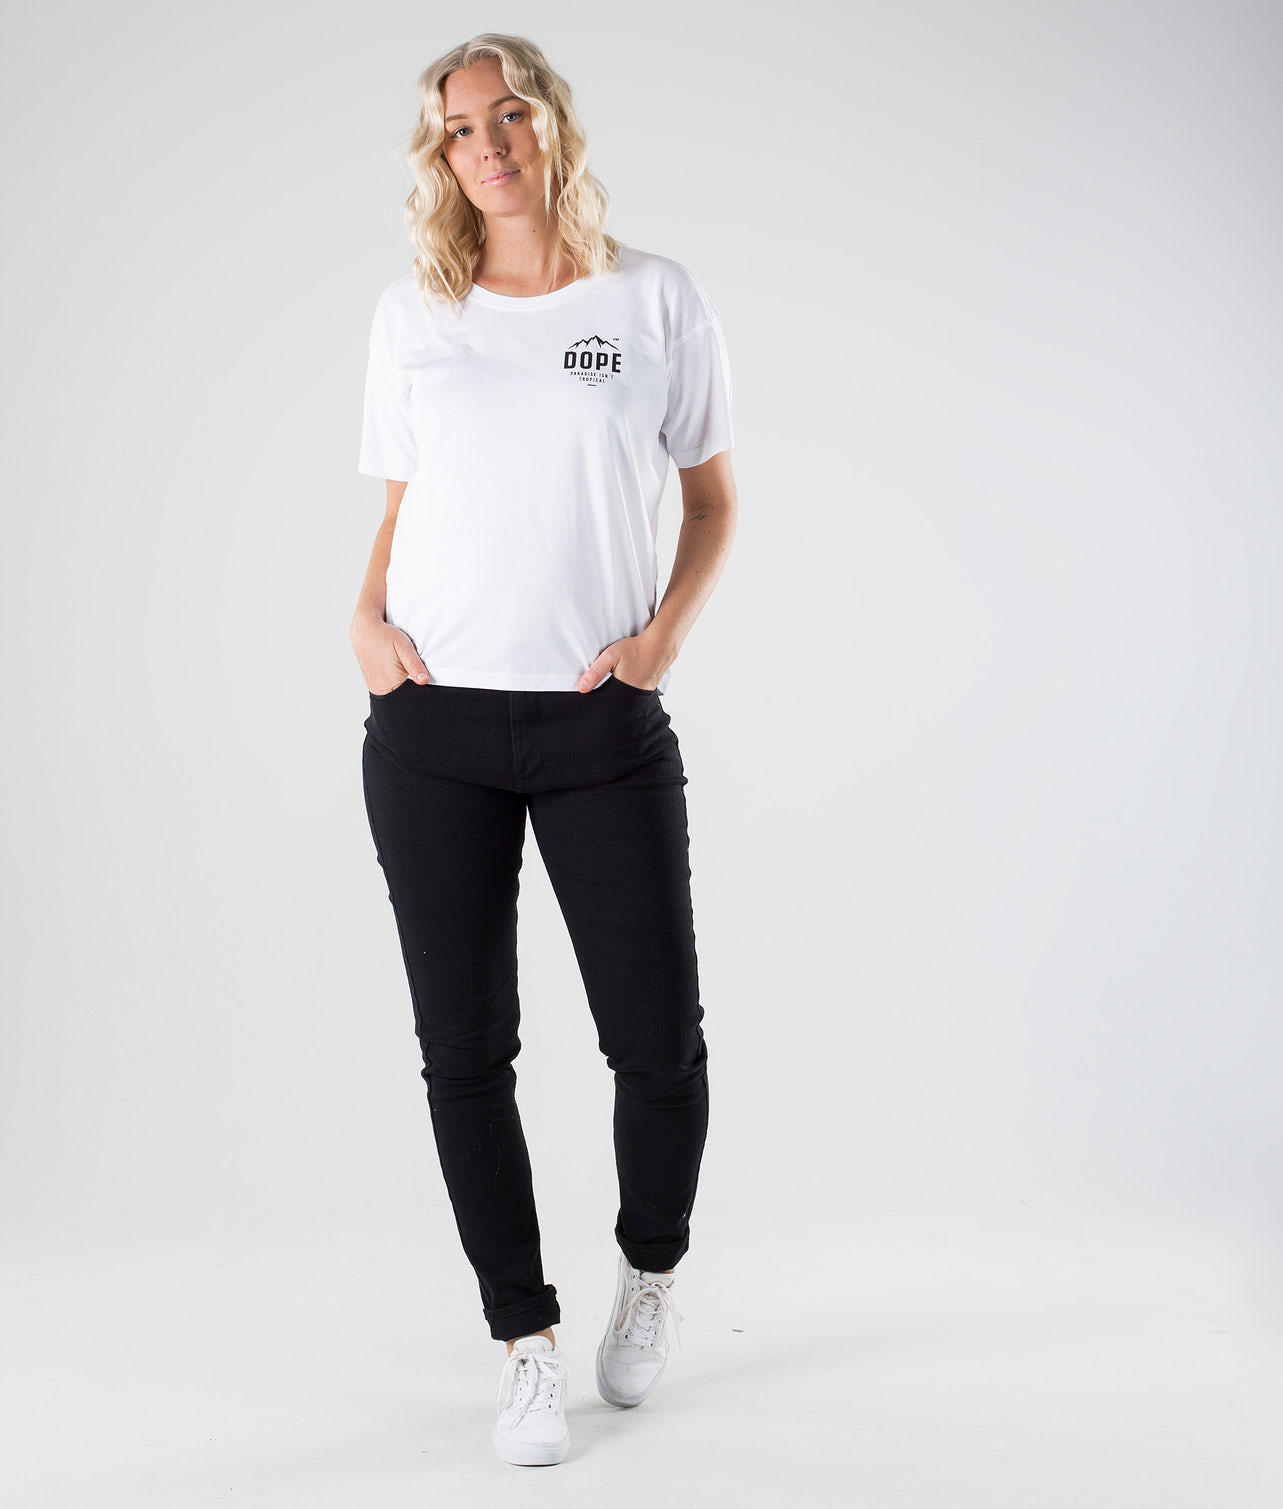 Dope Grand Paradise II T-shirt White